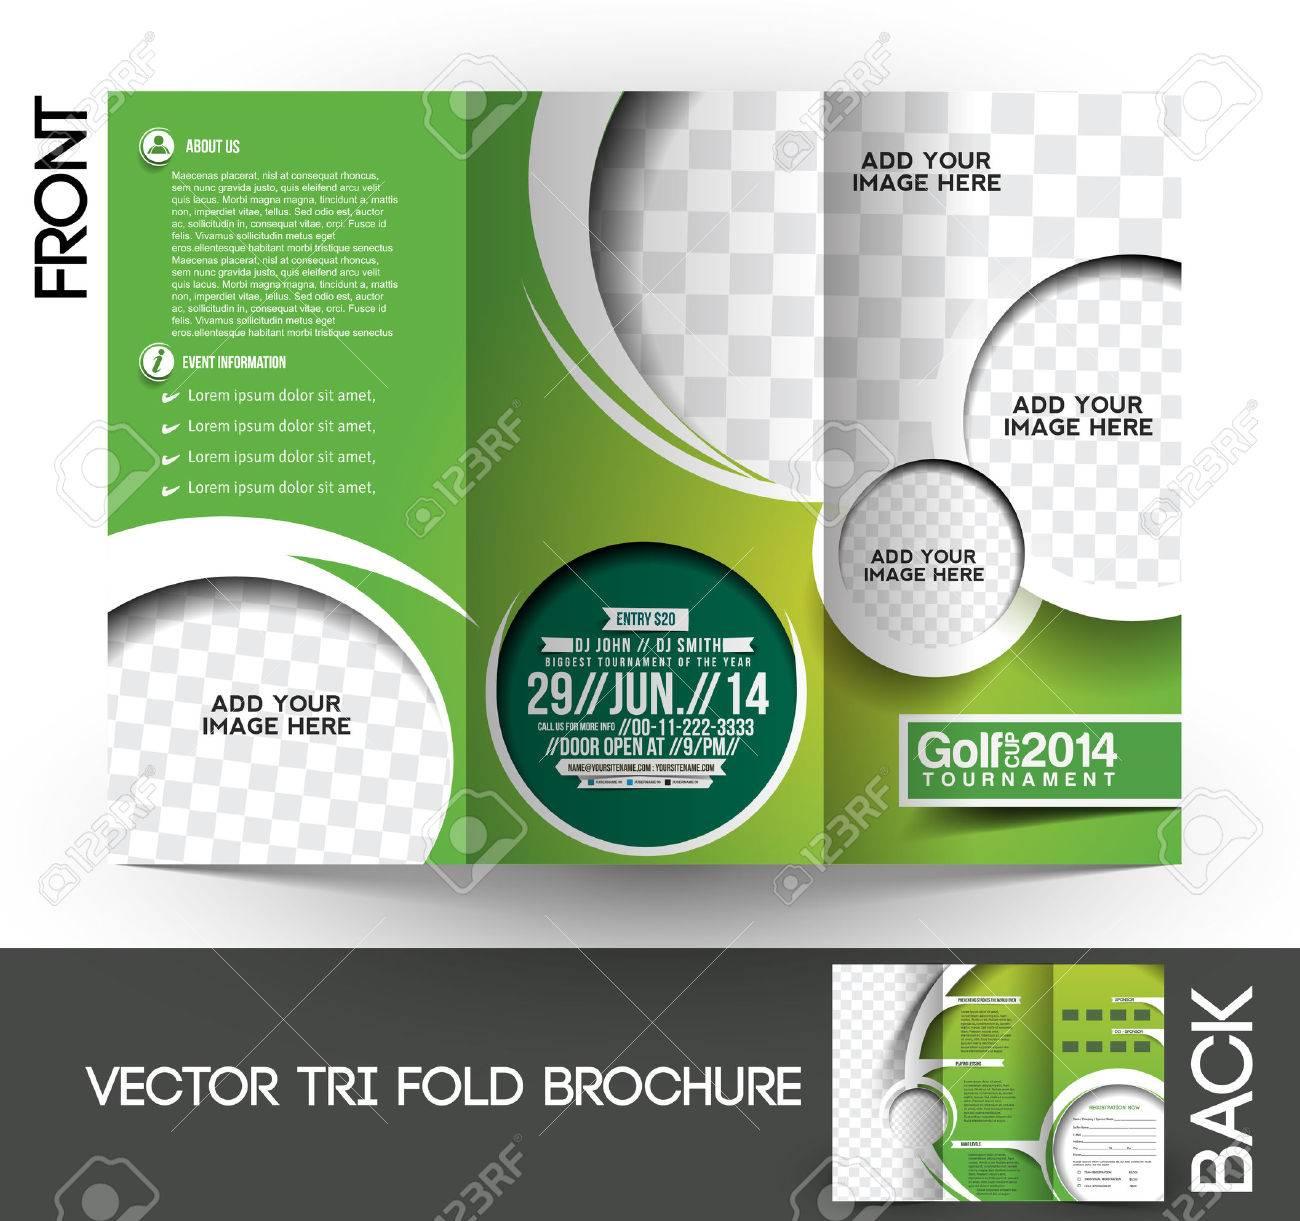 Golf Tournament Brochure | Tri Fold Golf Tournament Mock Up Brochure Design Royalty Free